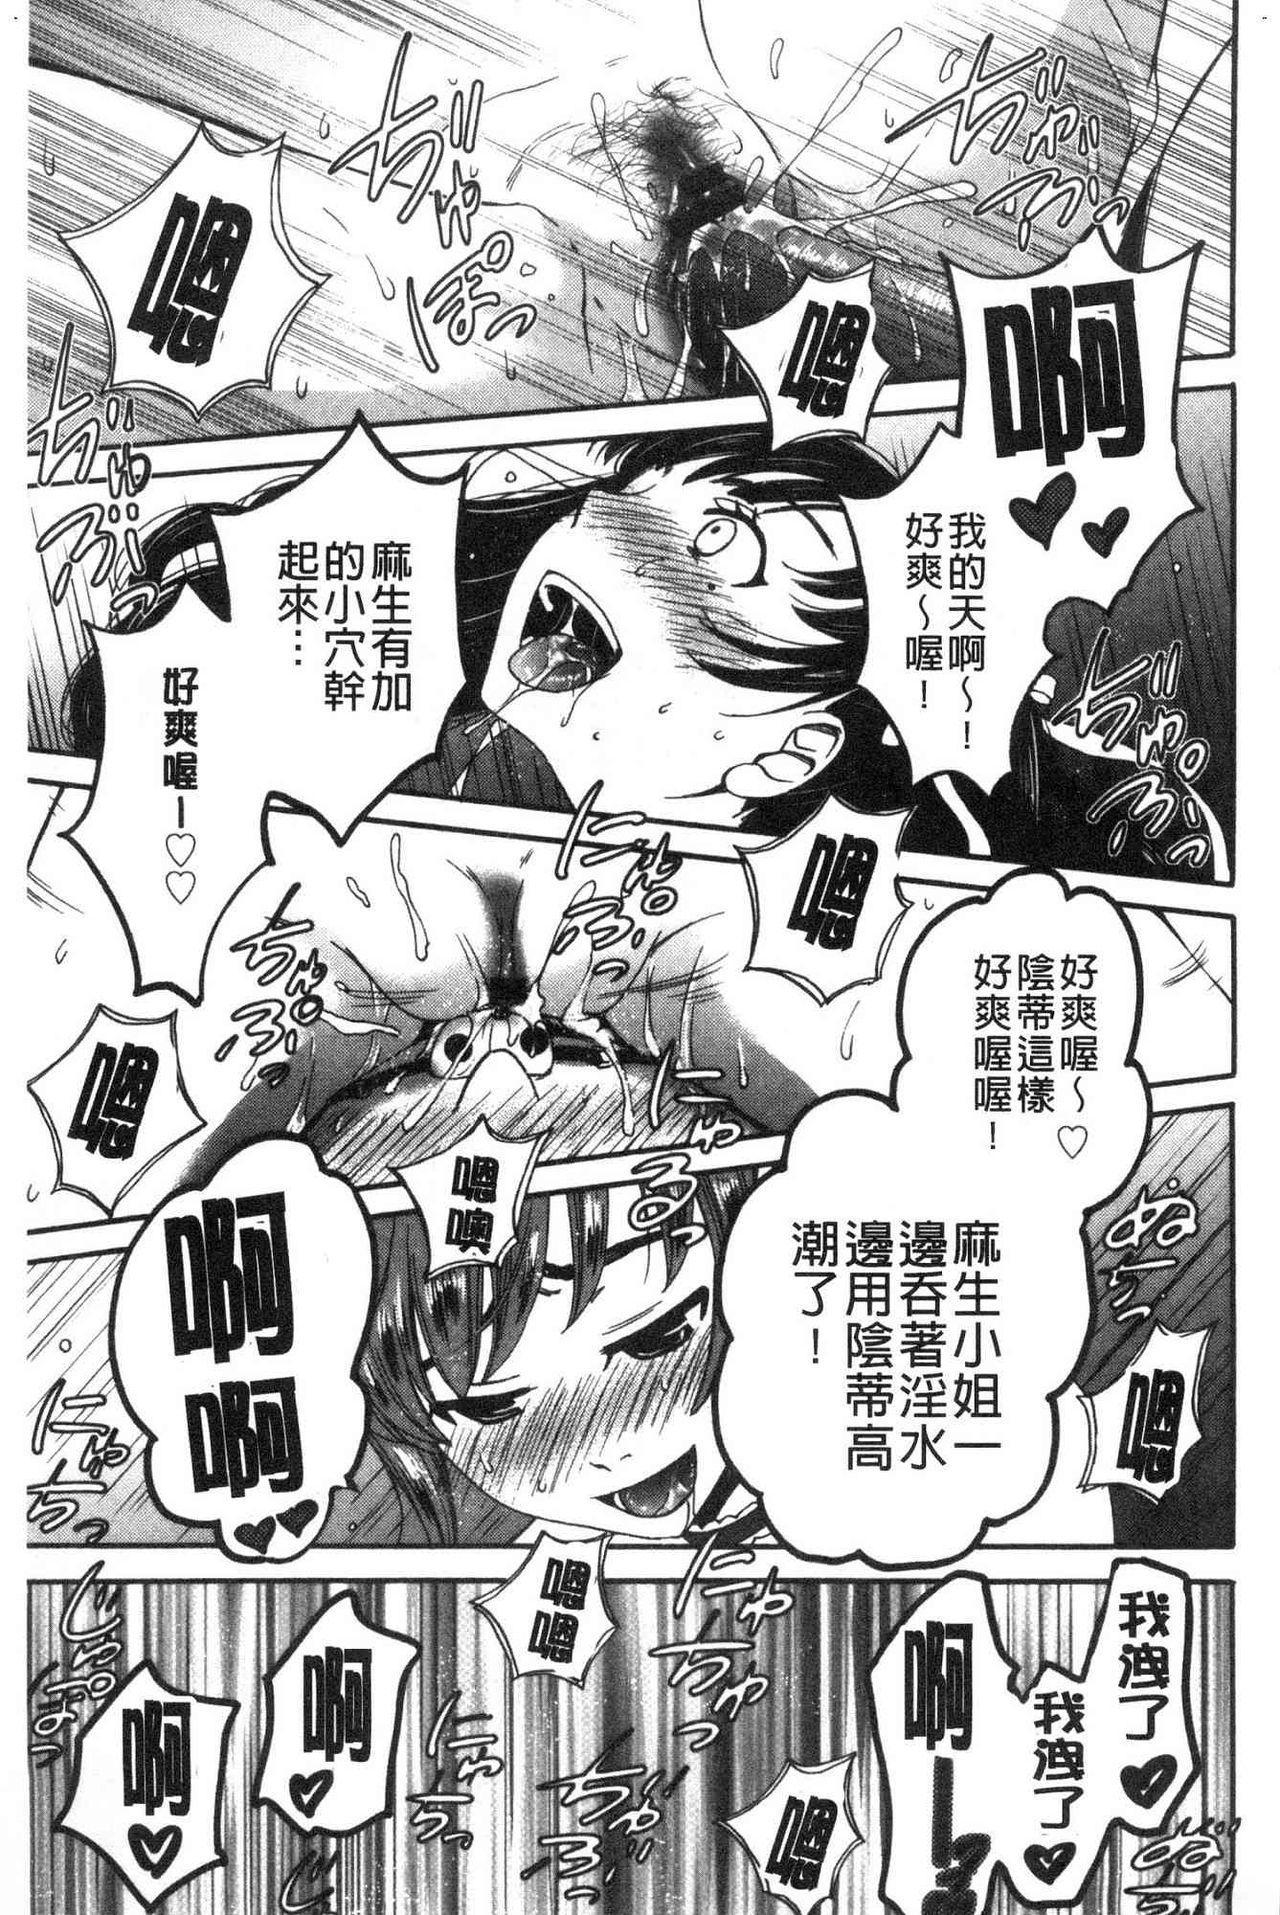 [Gotoh Akira]  21-ji no Onna ~Camera no Mae no Mesuinu~ 2 | 21時之女 ~鏡頭前的牝犬~ 2 [Chinese] 66